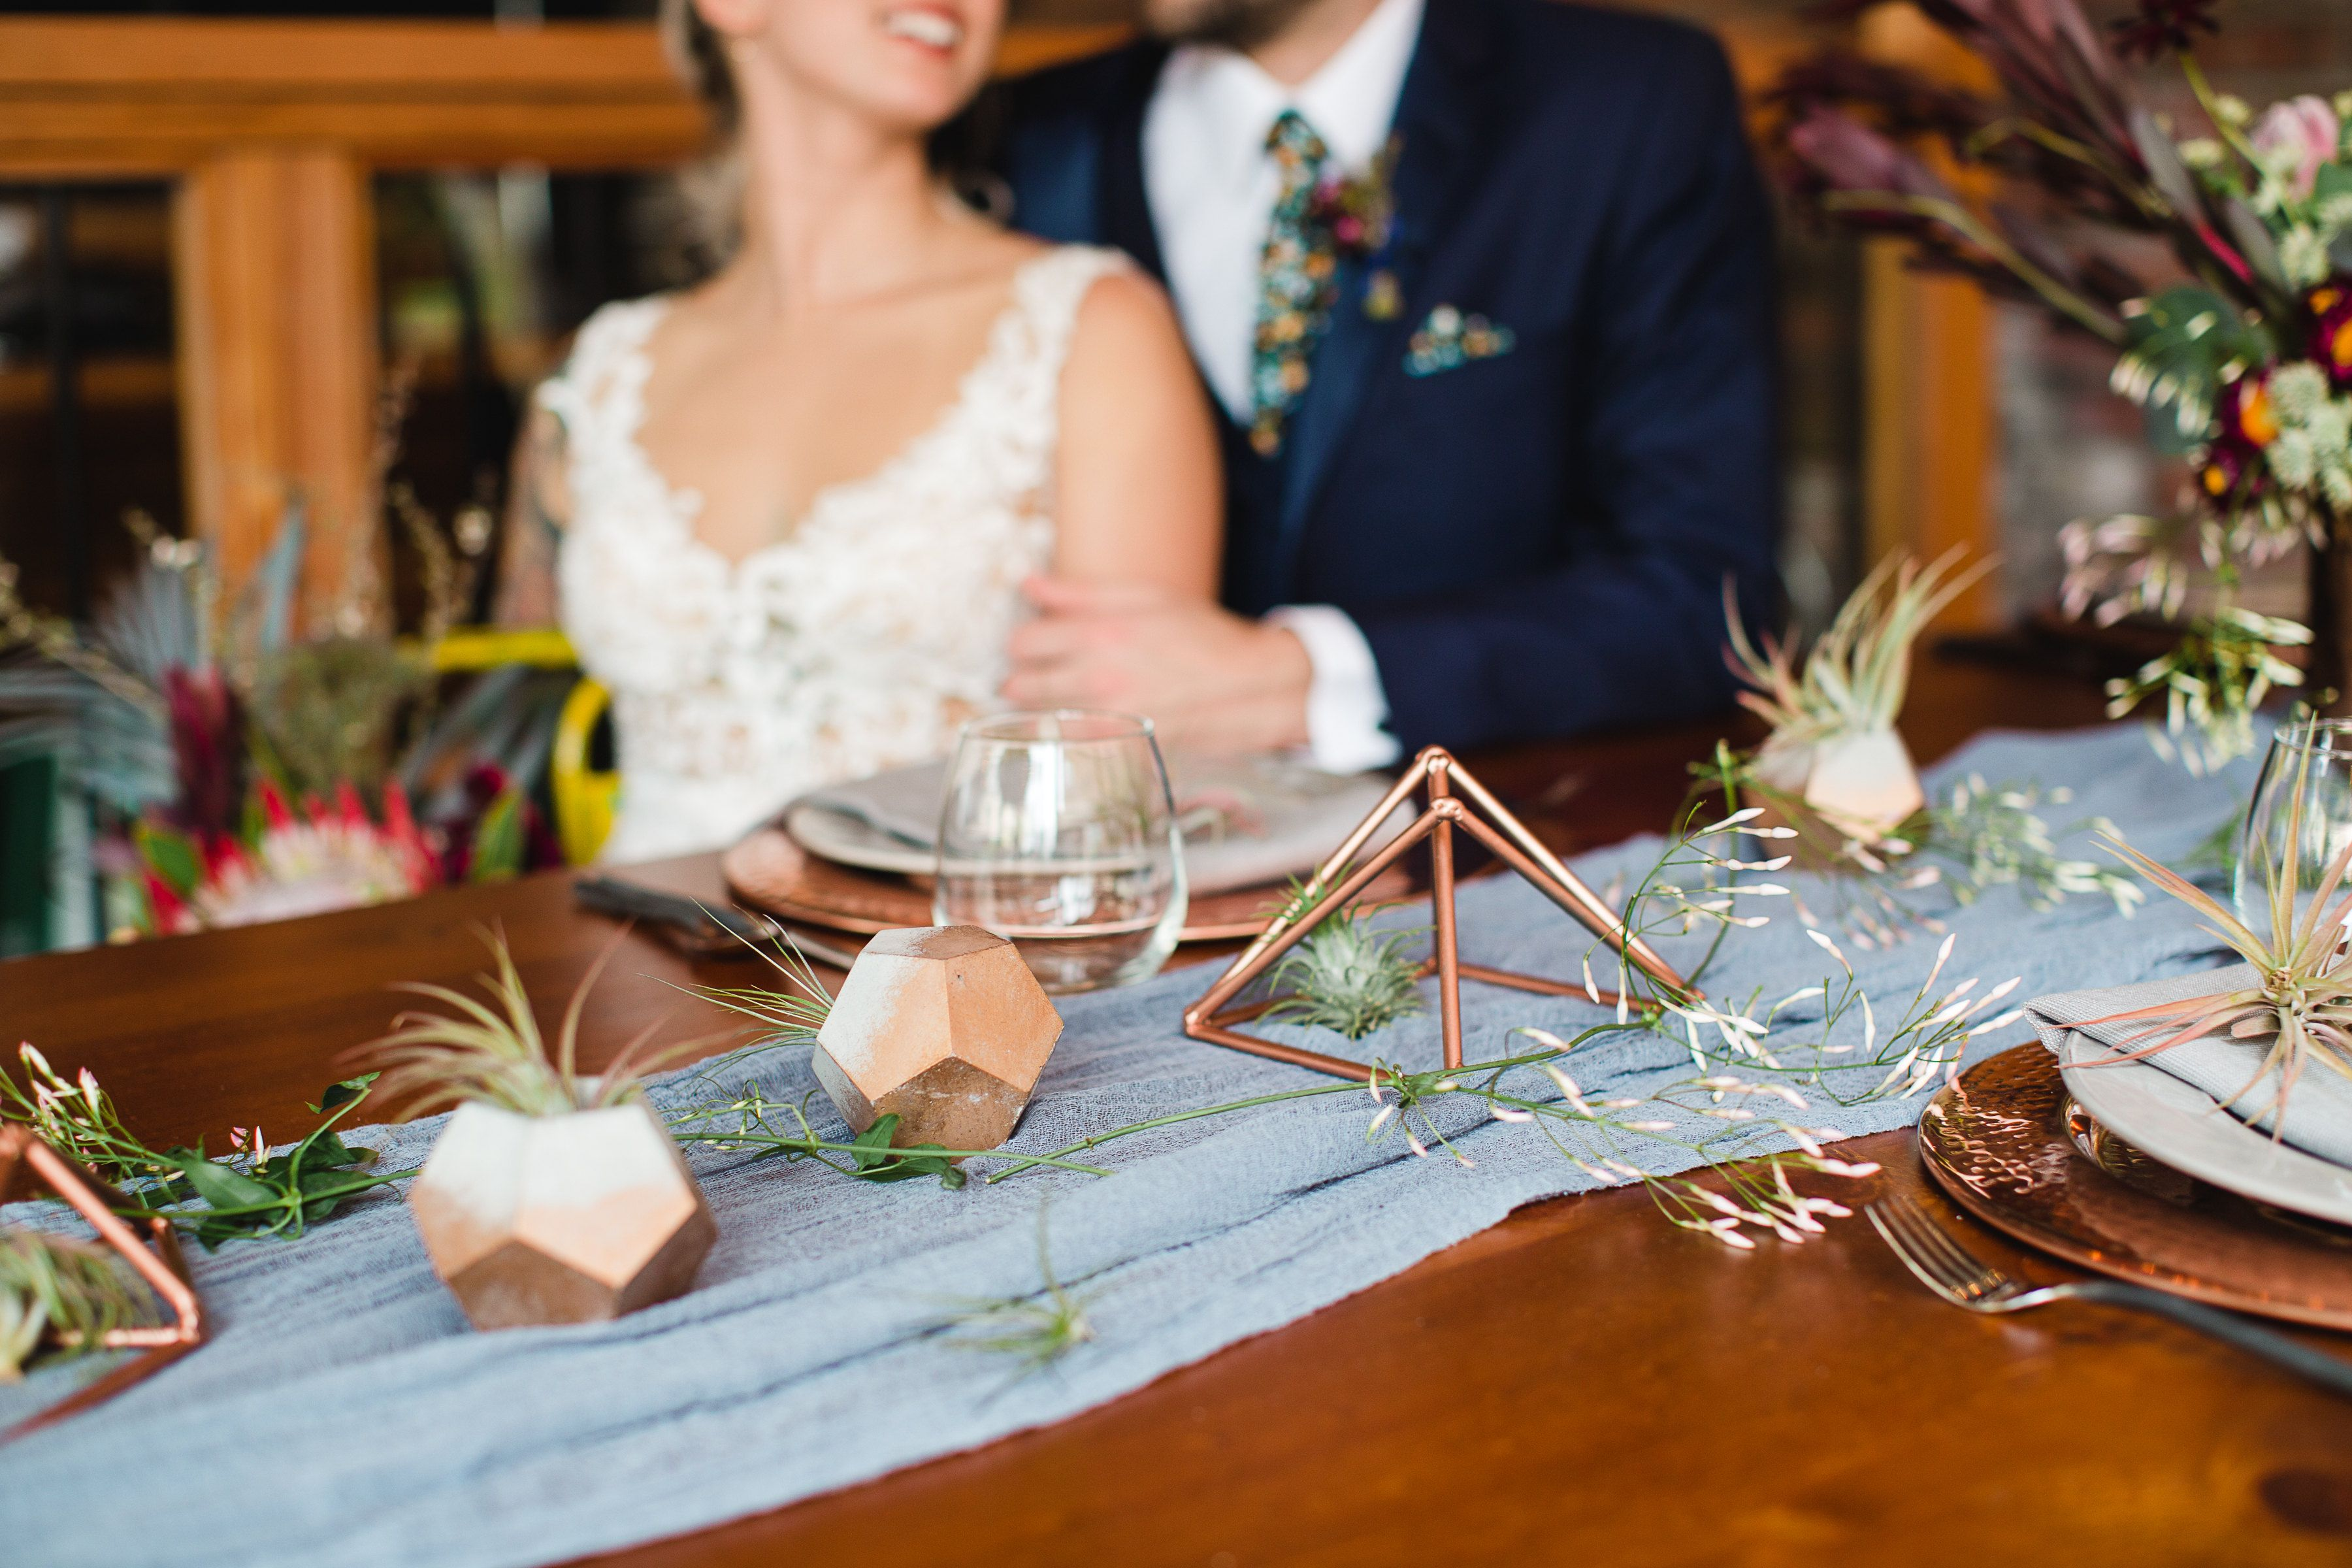 Light Blue Gauze Runner for Weddings Events Centerpieces Runner